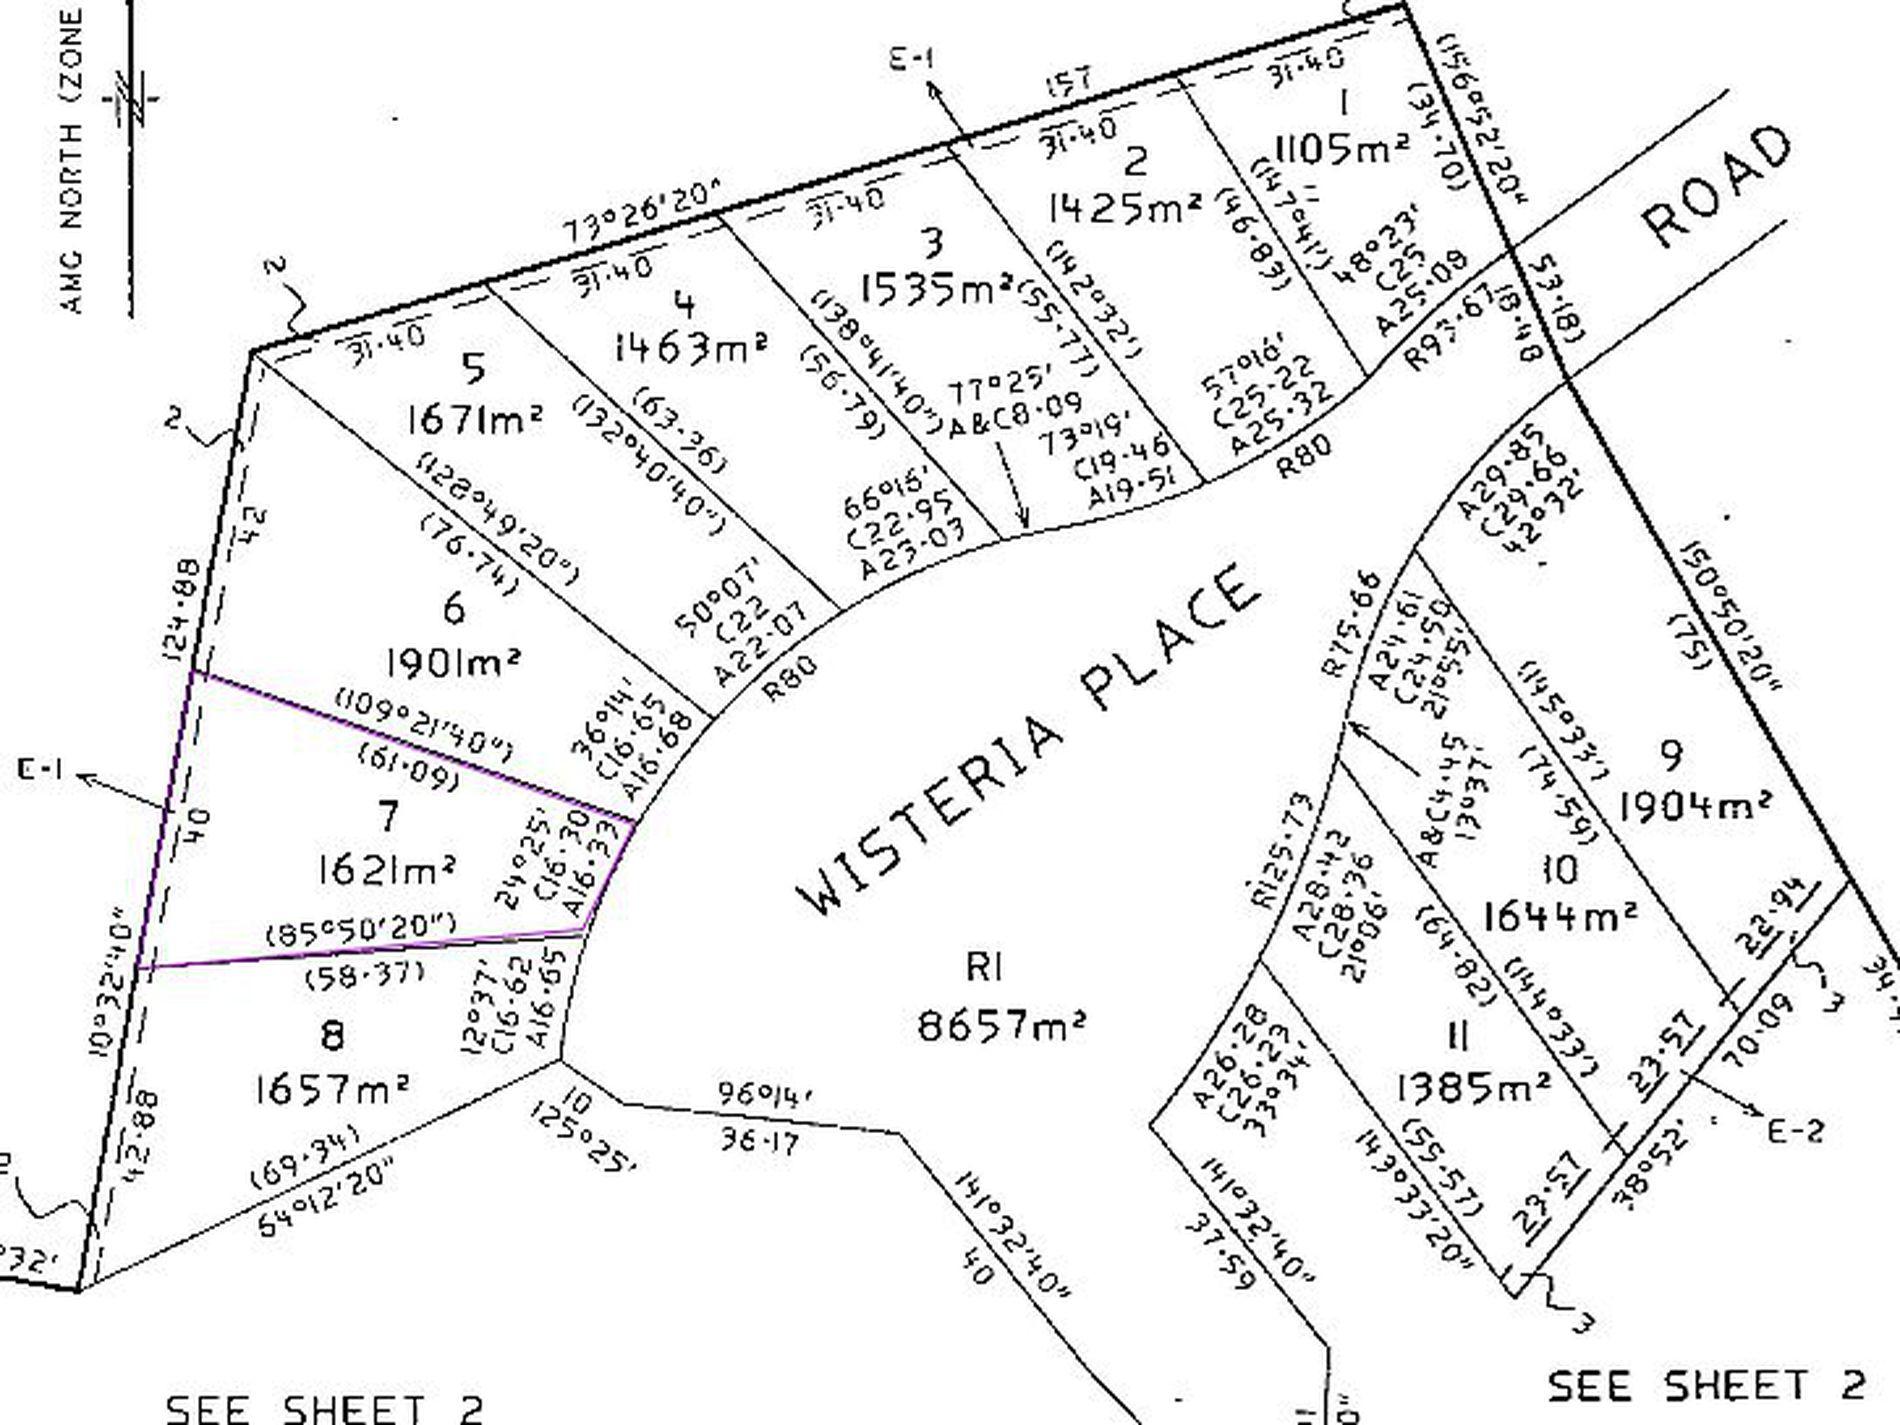 16 Wisteria Place, Paynesville